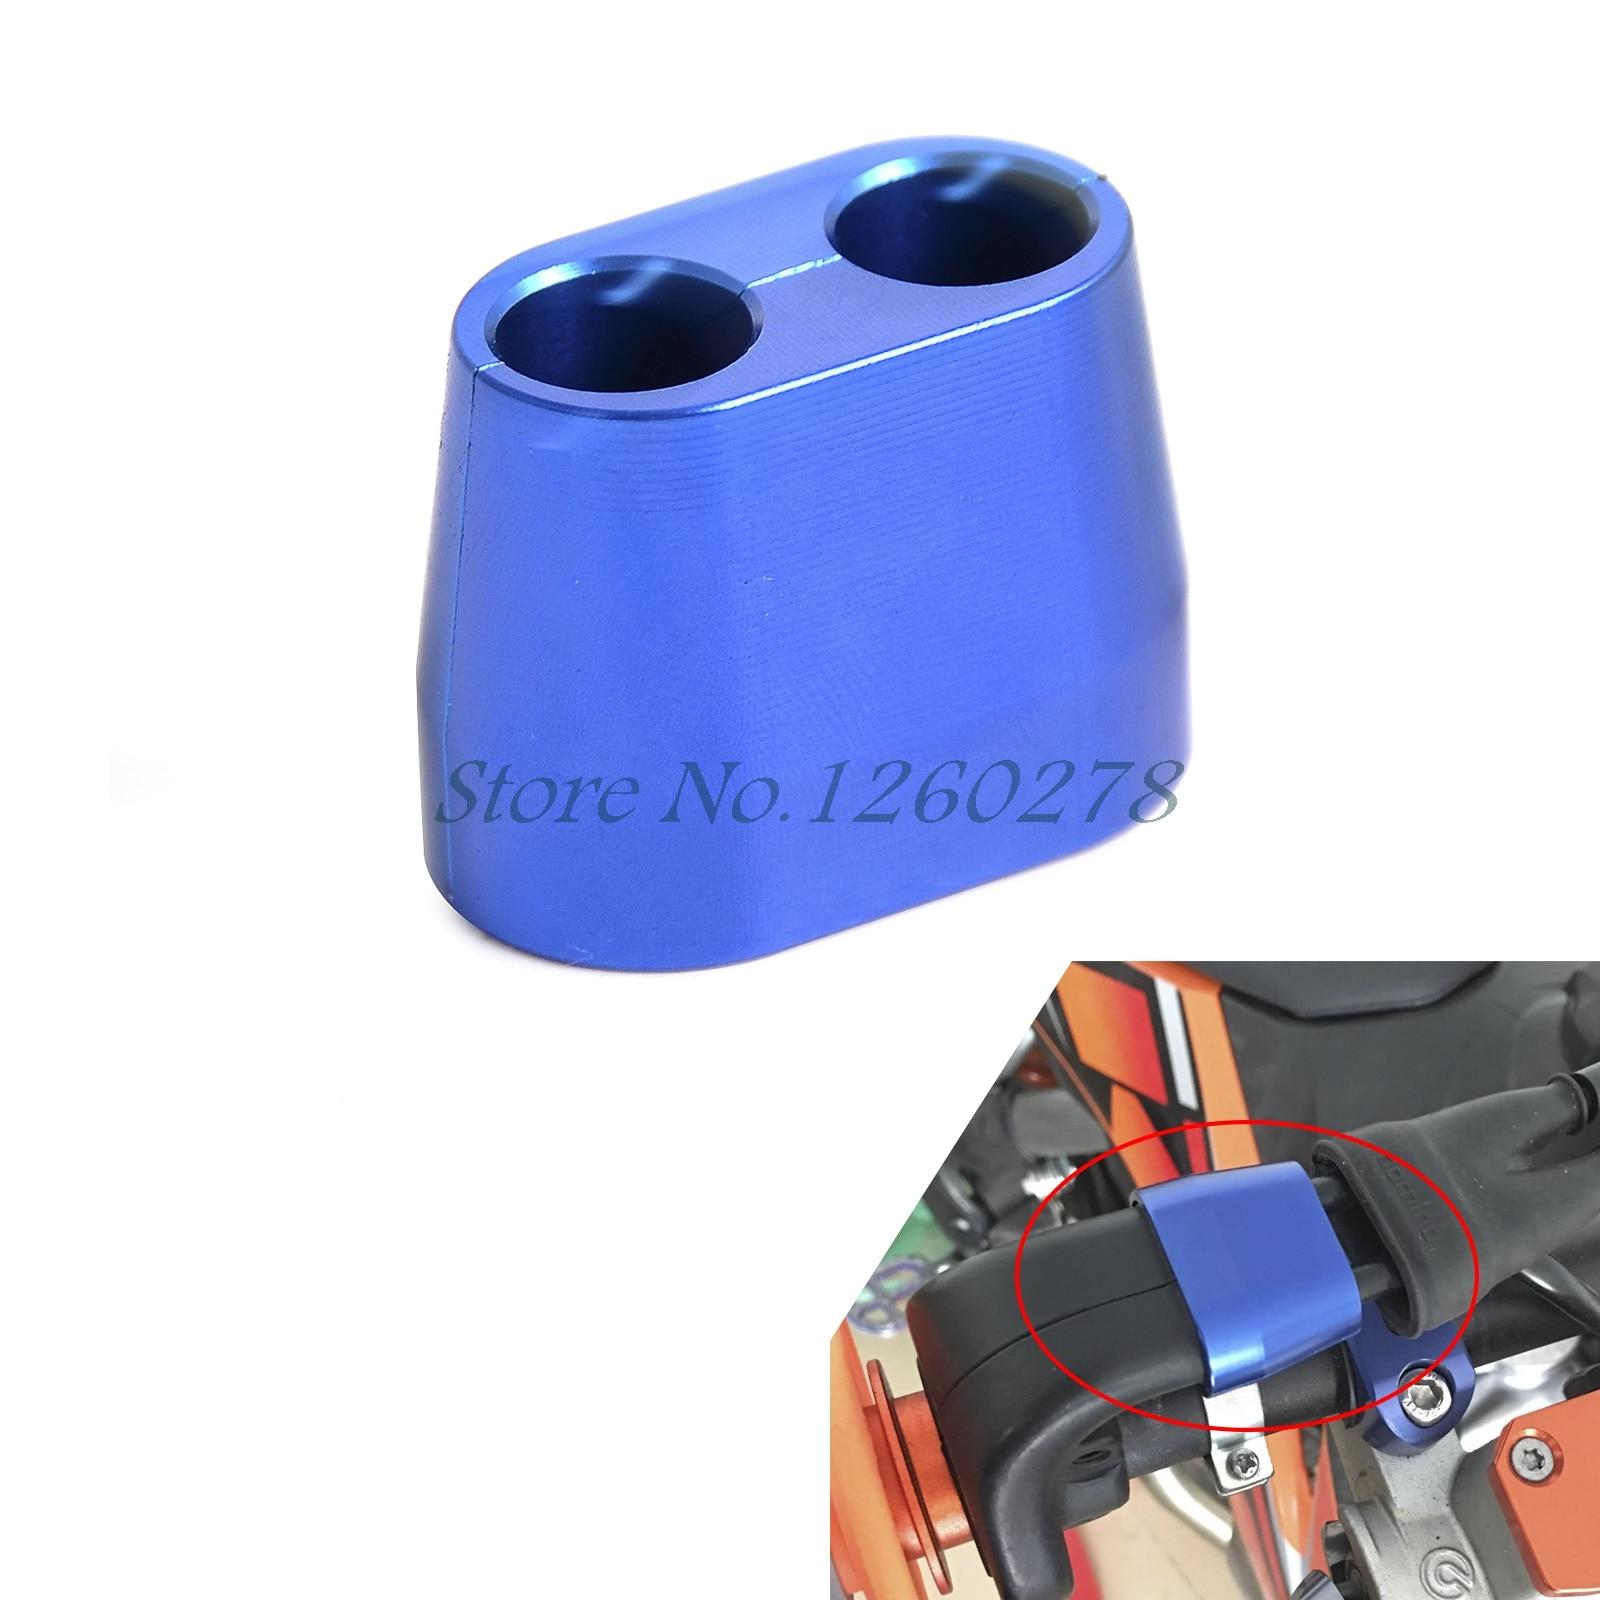 Throttle Cable Protector Guard Cover For Husaberg Husqvarna FE TE FC TC TXC SMR SM SMS 250 350 450 449 511 501 570 610